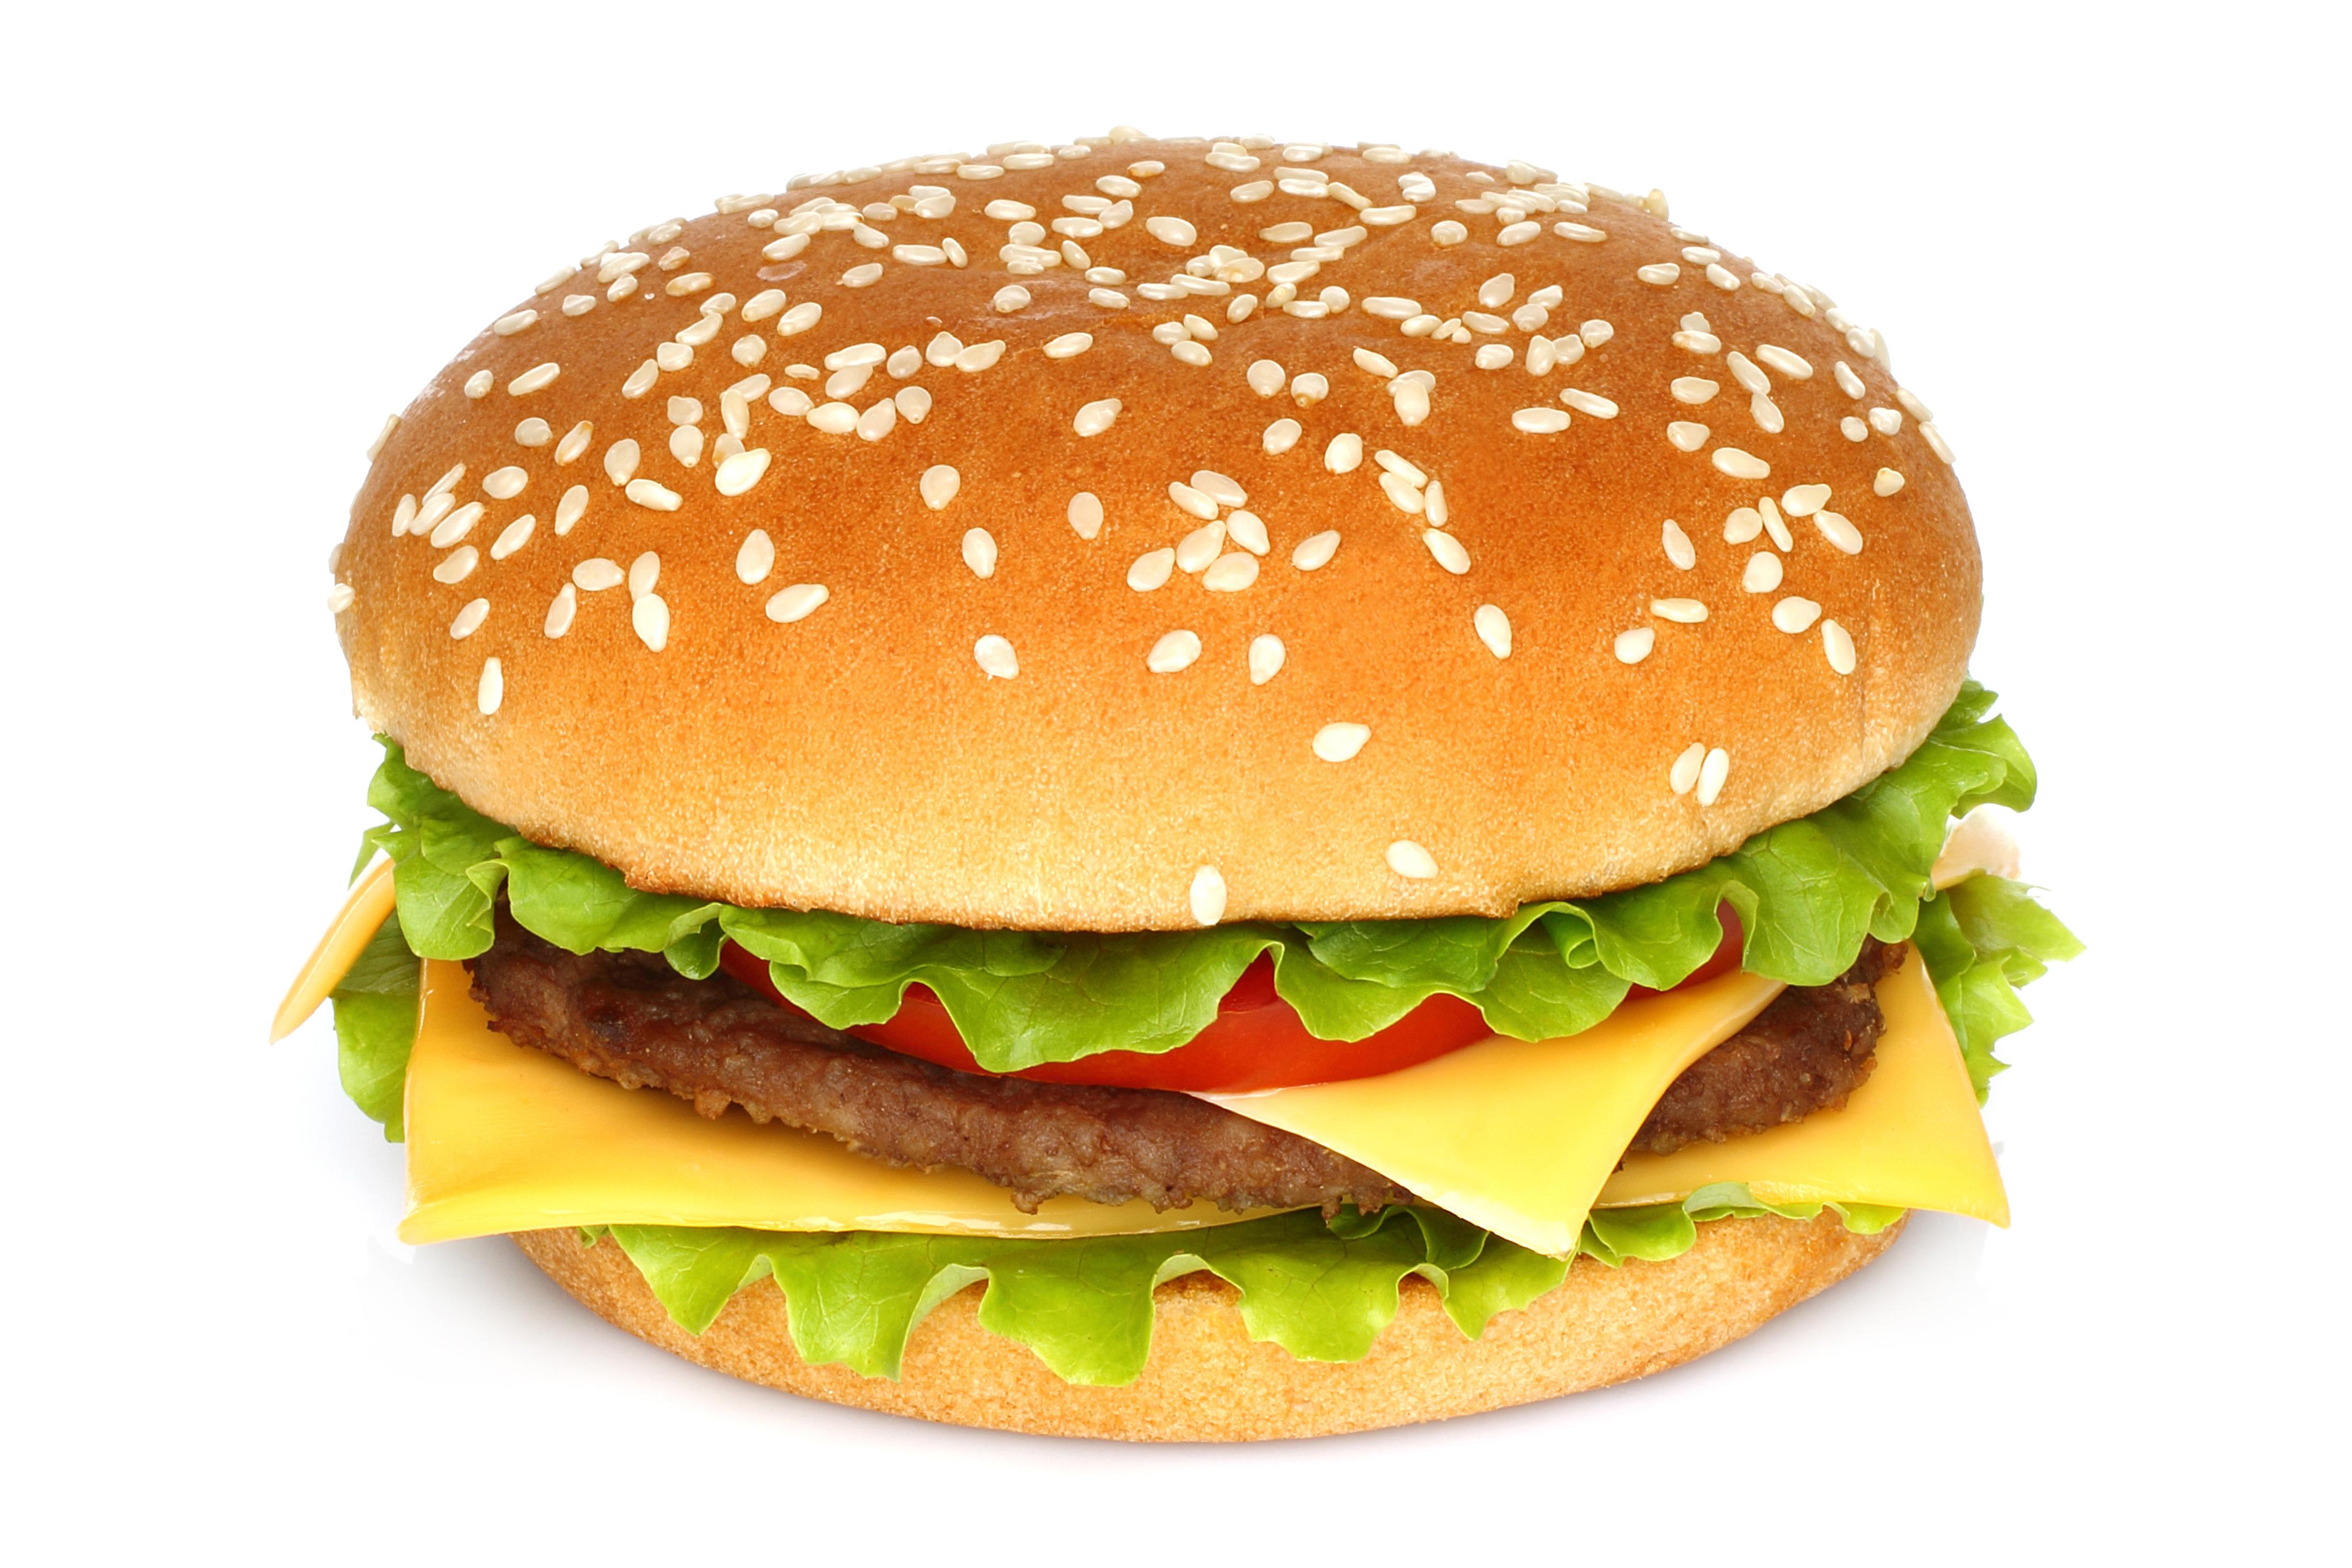 11 Surprising Foods With Way More Calories Than A McDonalds Cheeseburger